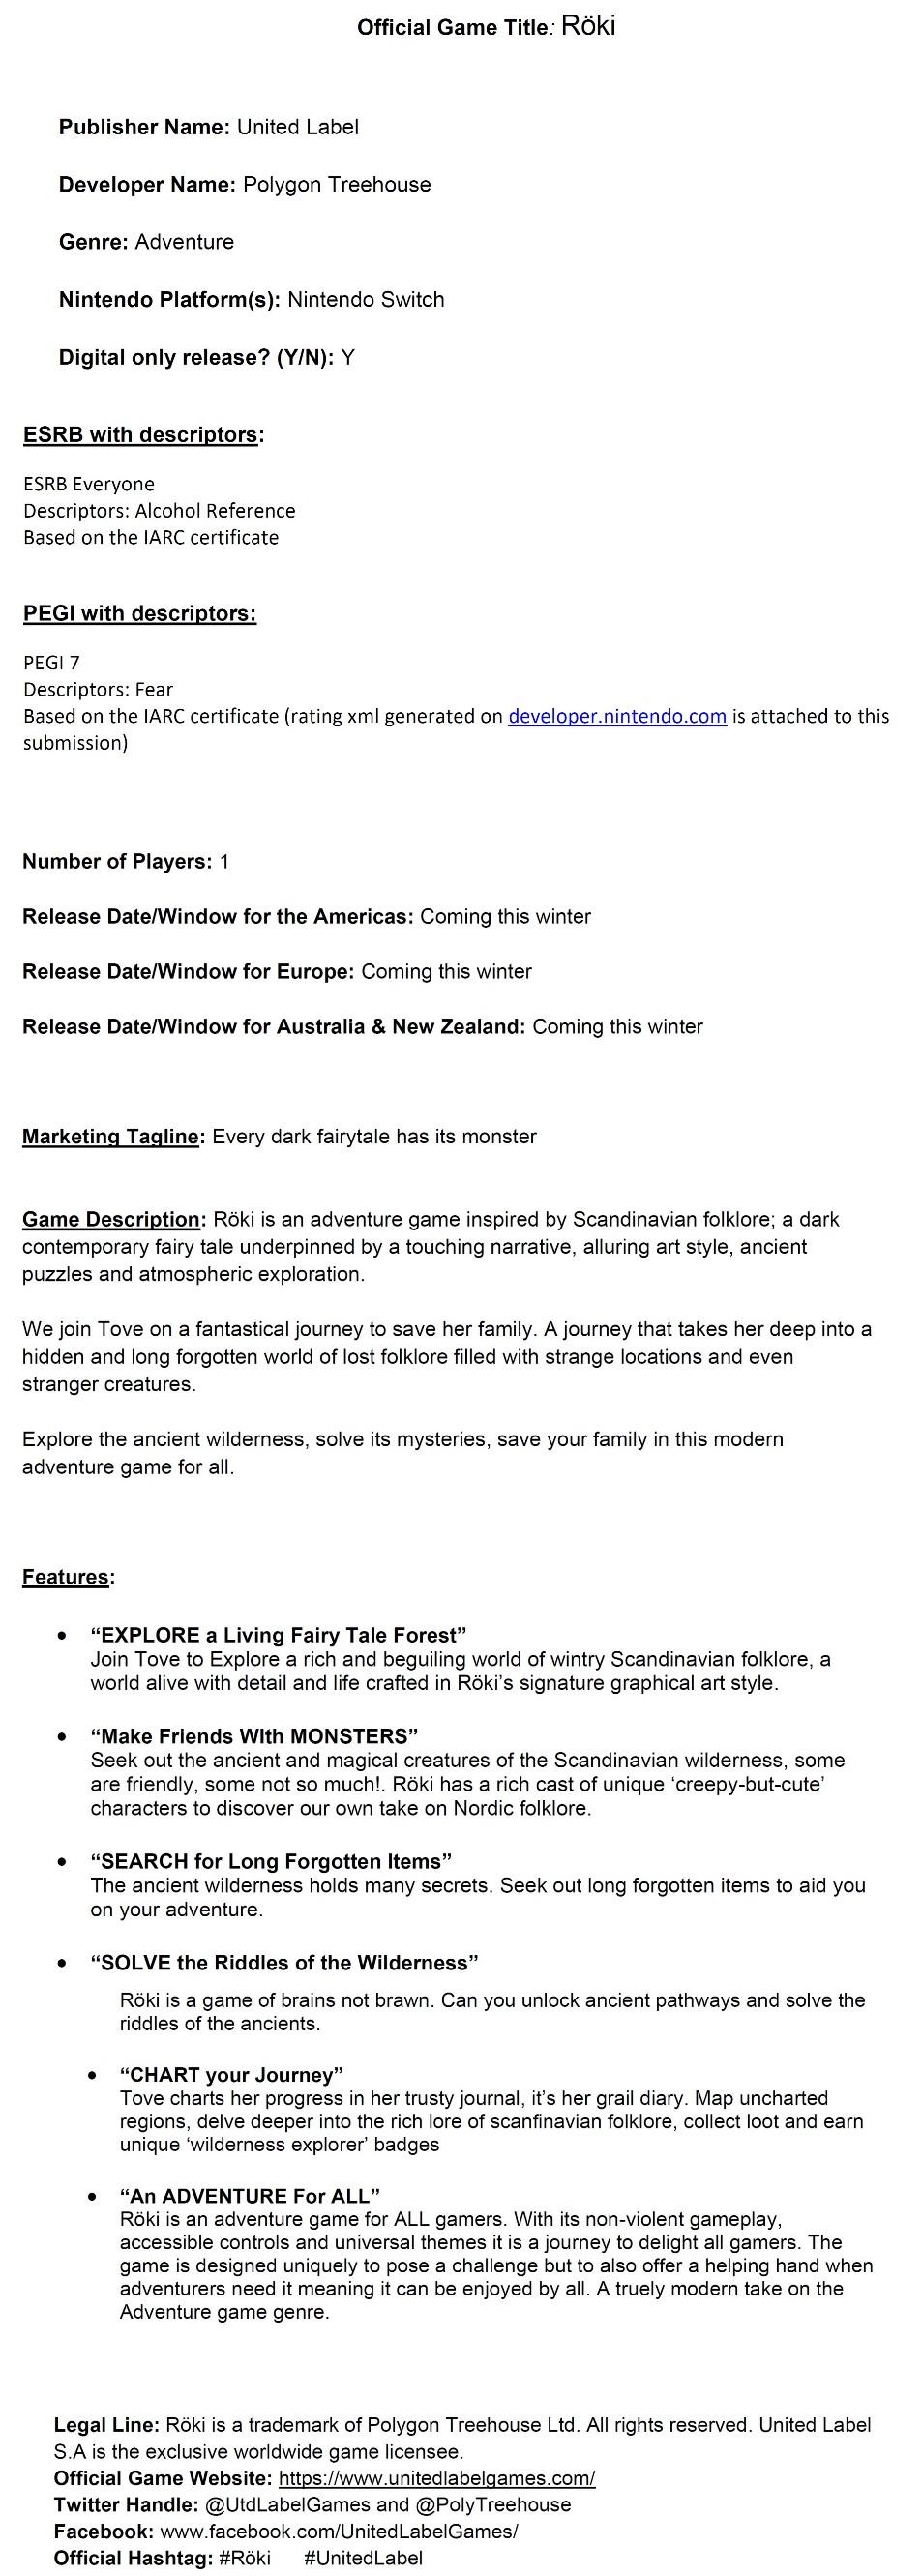 fact sheet Archives - Nintendo Everything